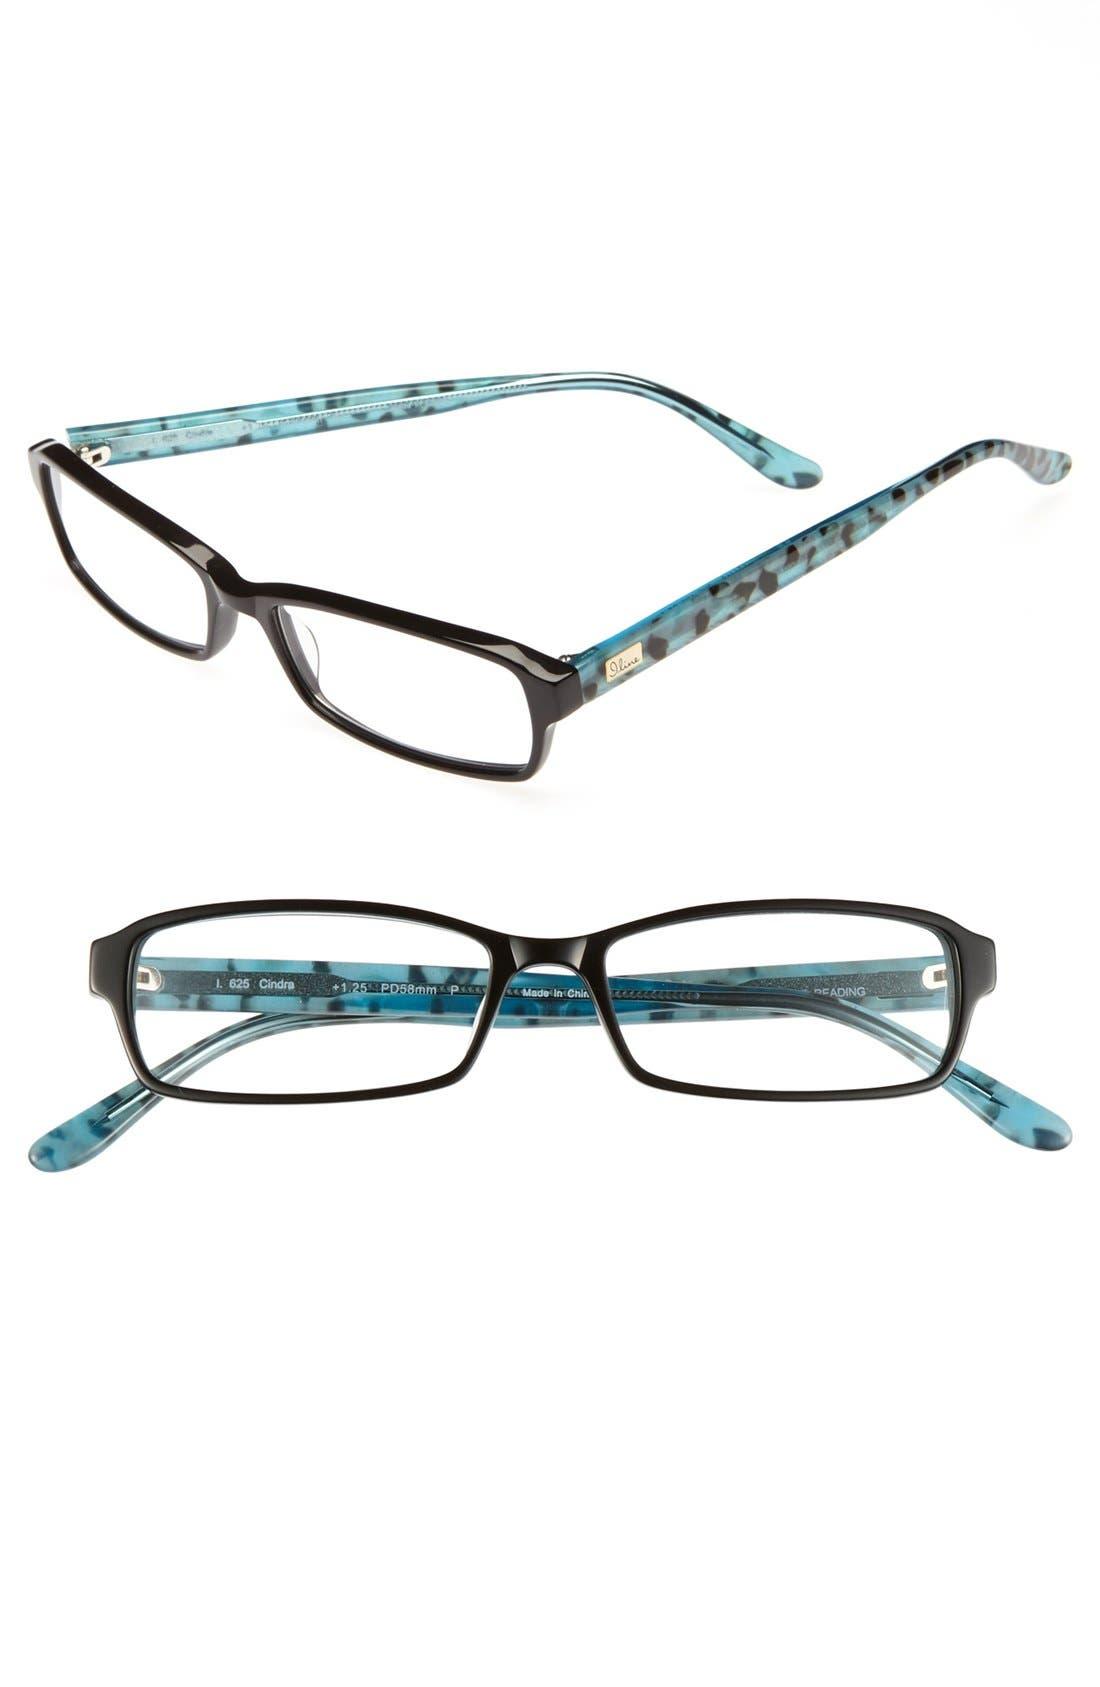 Main Image - I Line Eyewear 'Cindra' 52mm Reading Glasses (2 for $88)